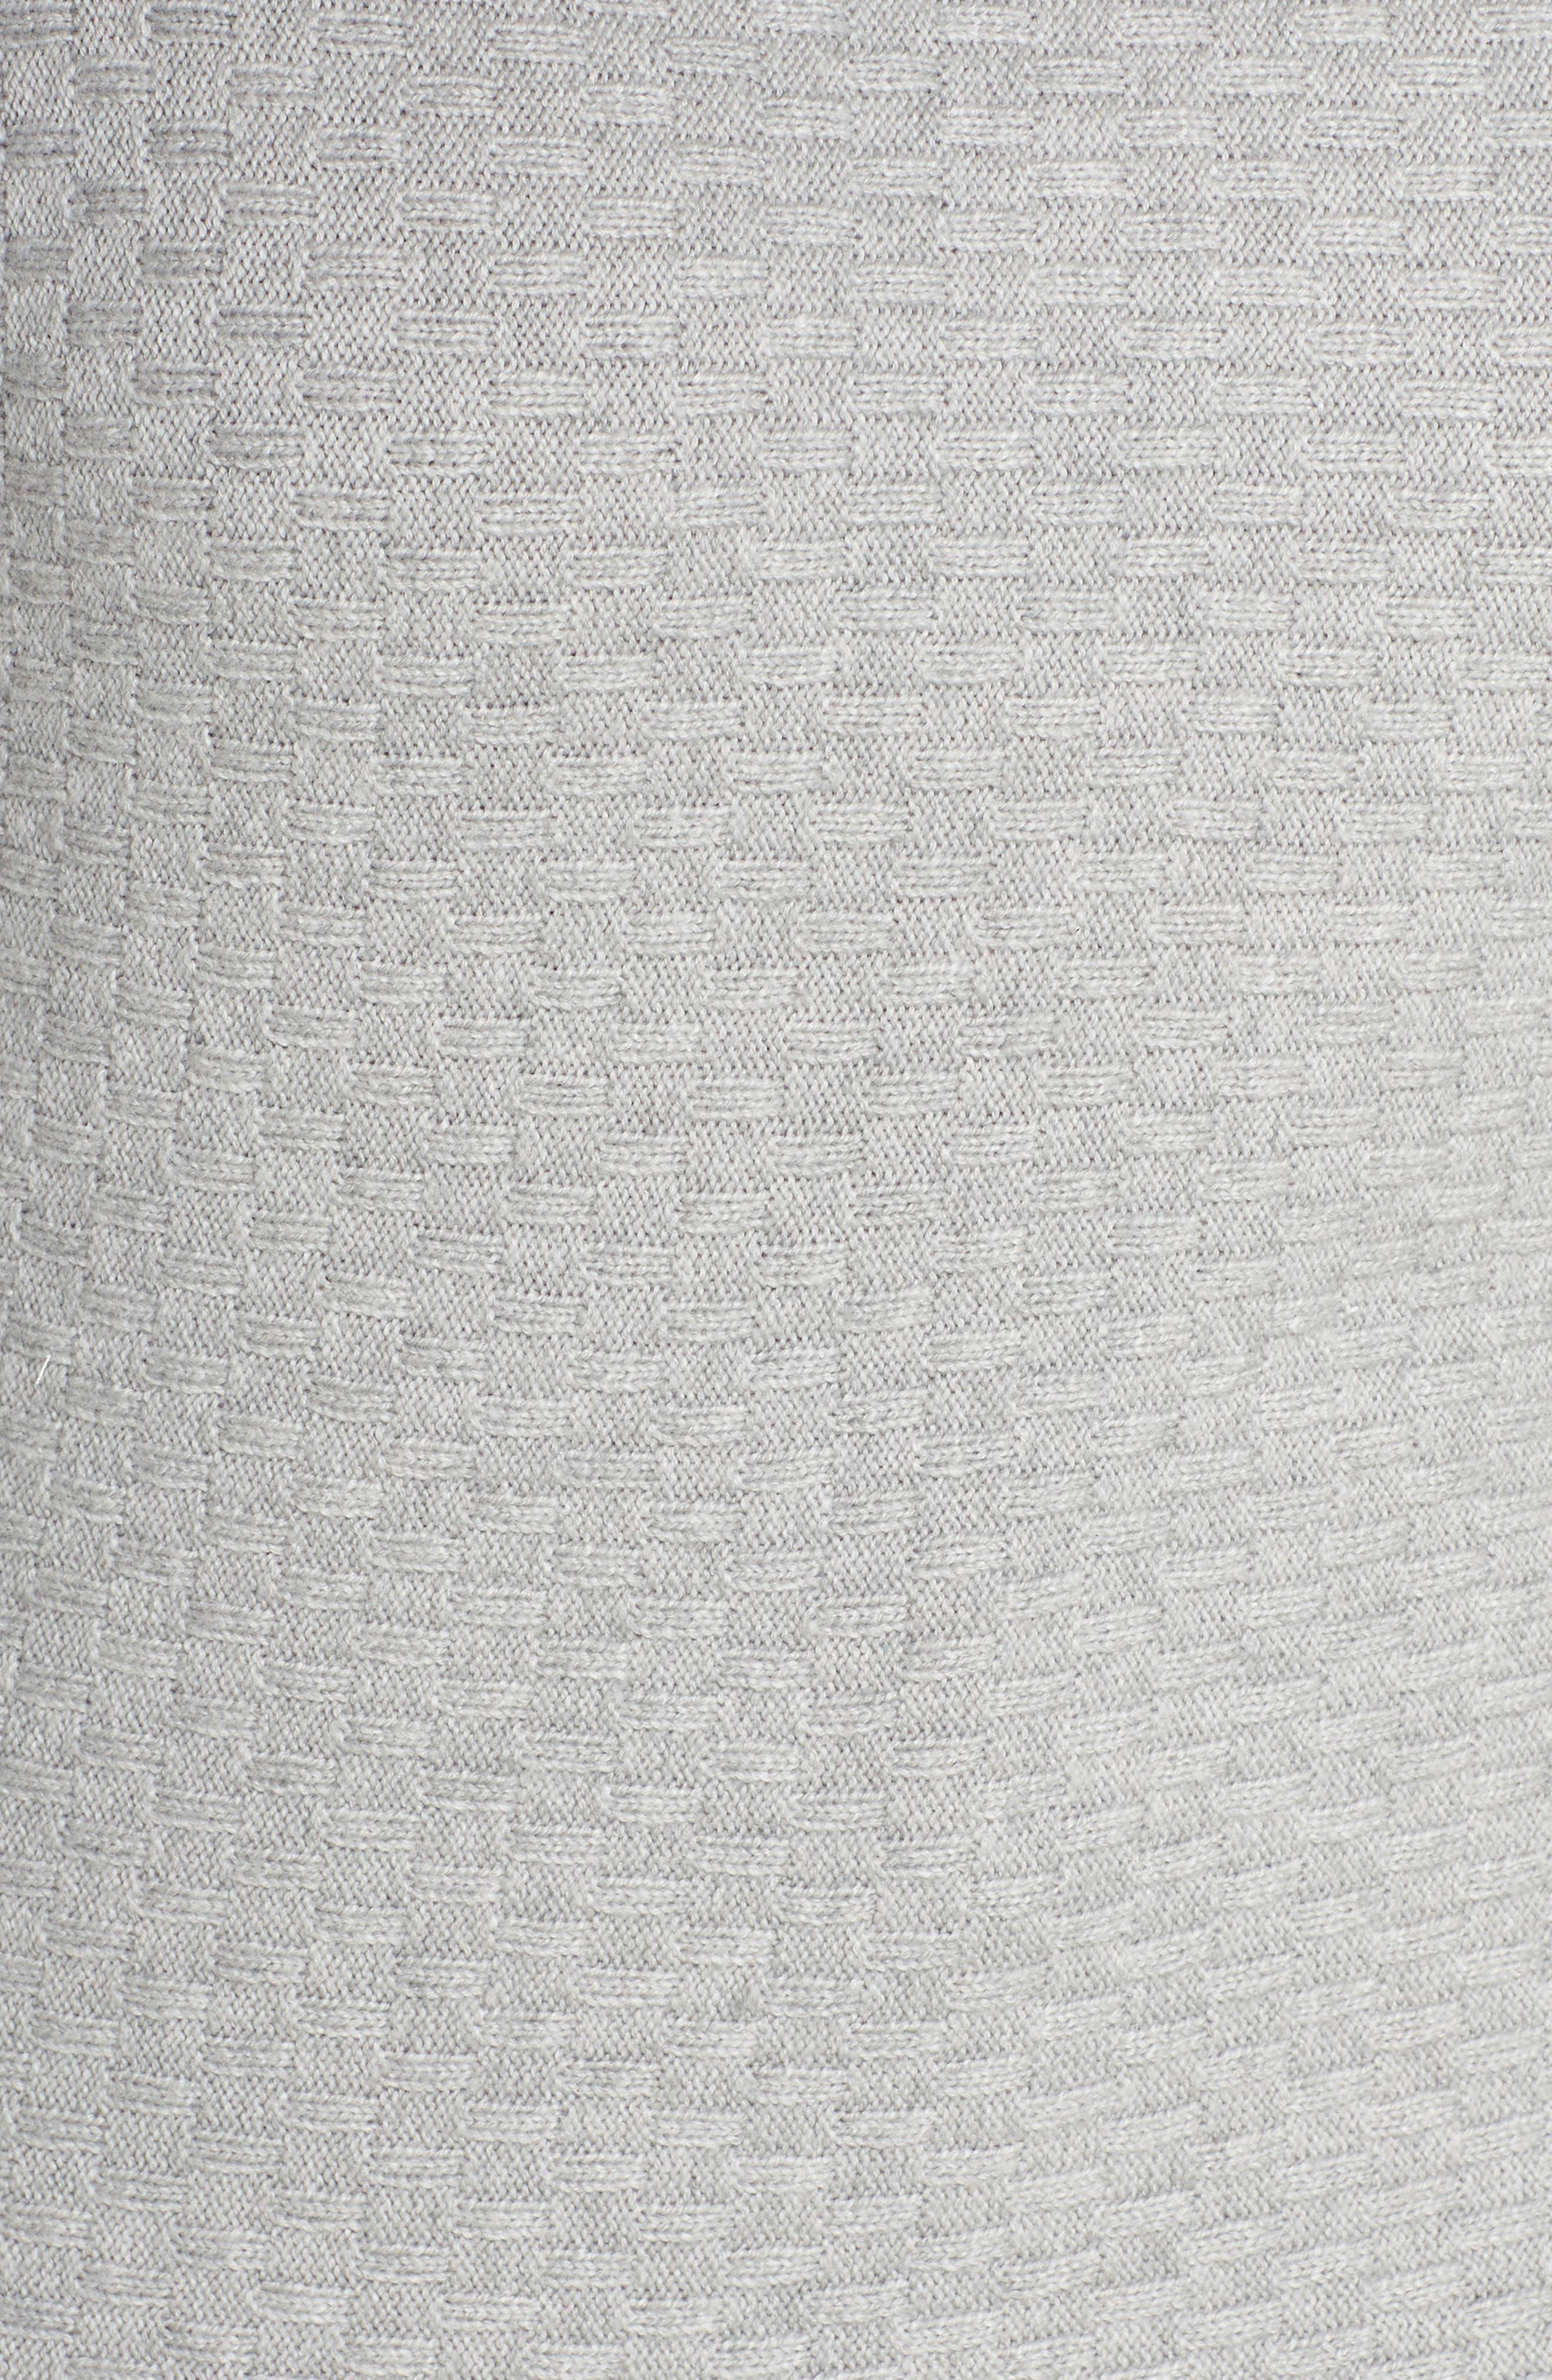 Boatneck Sweater,                             Alternate thumbnail 5, color,                             LIGHT HEATHER GREY